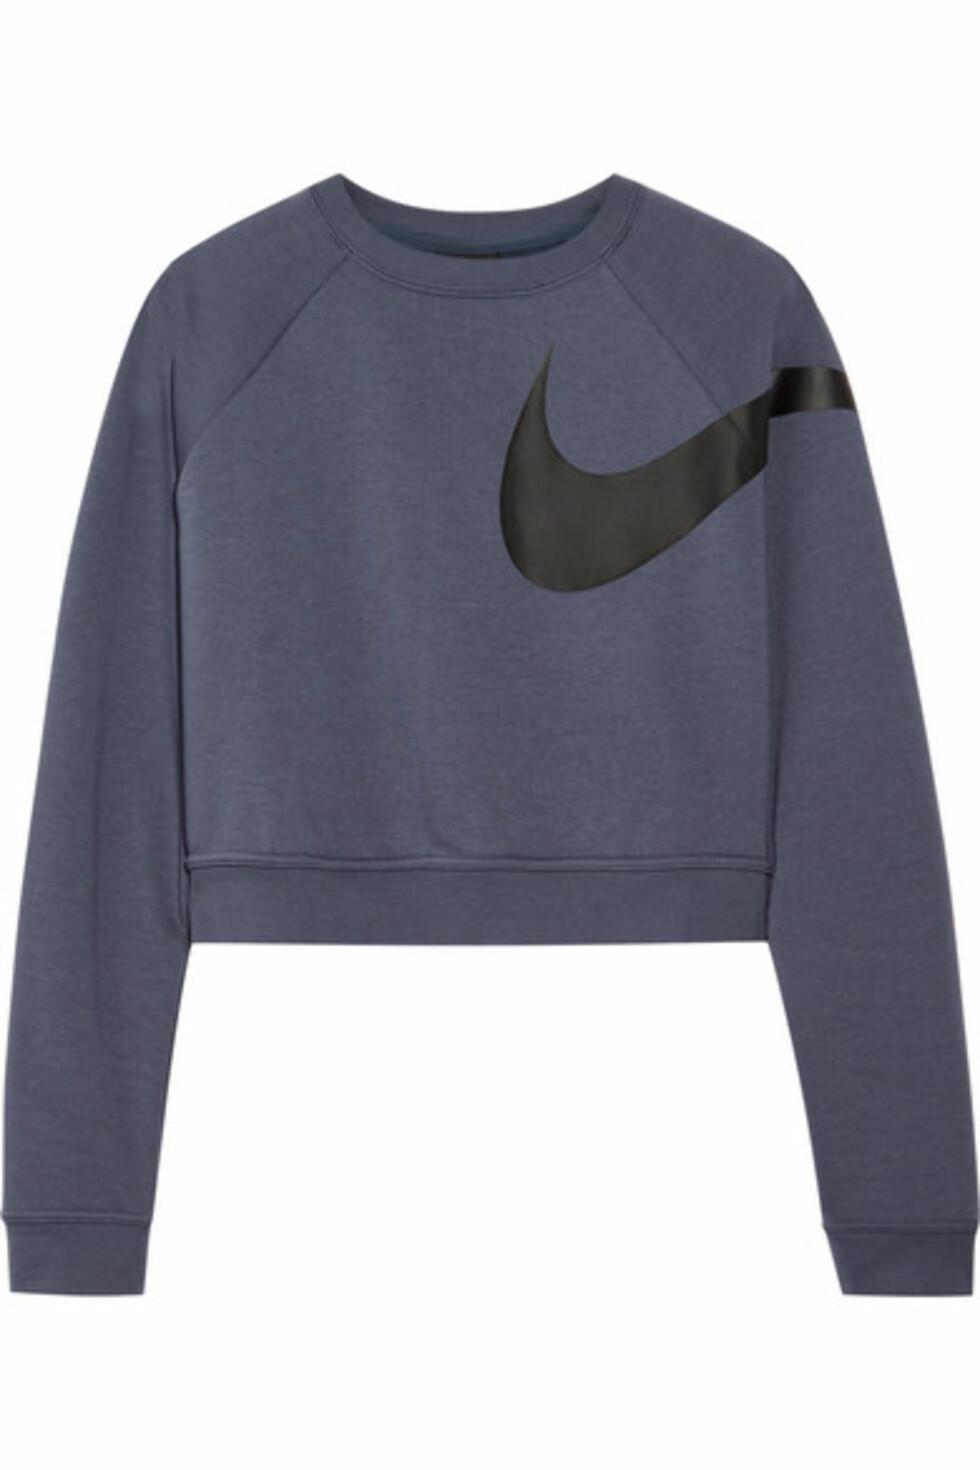 Genser fra Nike |800,-| https://www.net-a-porter.com/no/en/product/950039/nike/versa-cropped-dri-fit-stretch-top